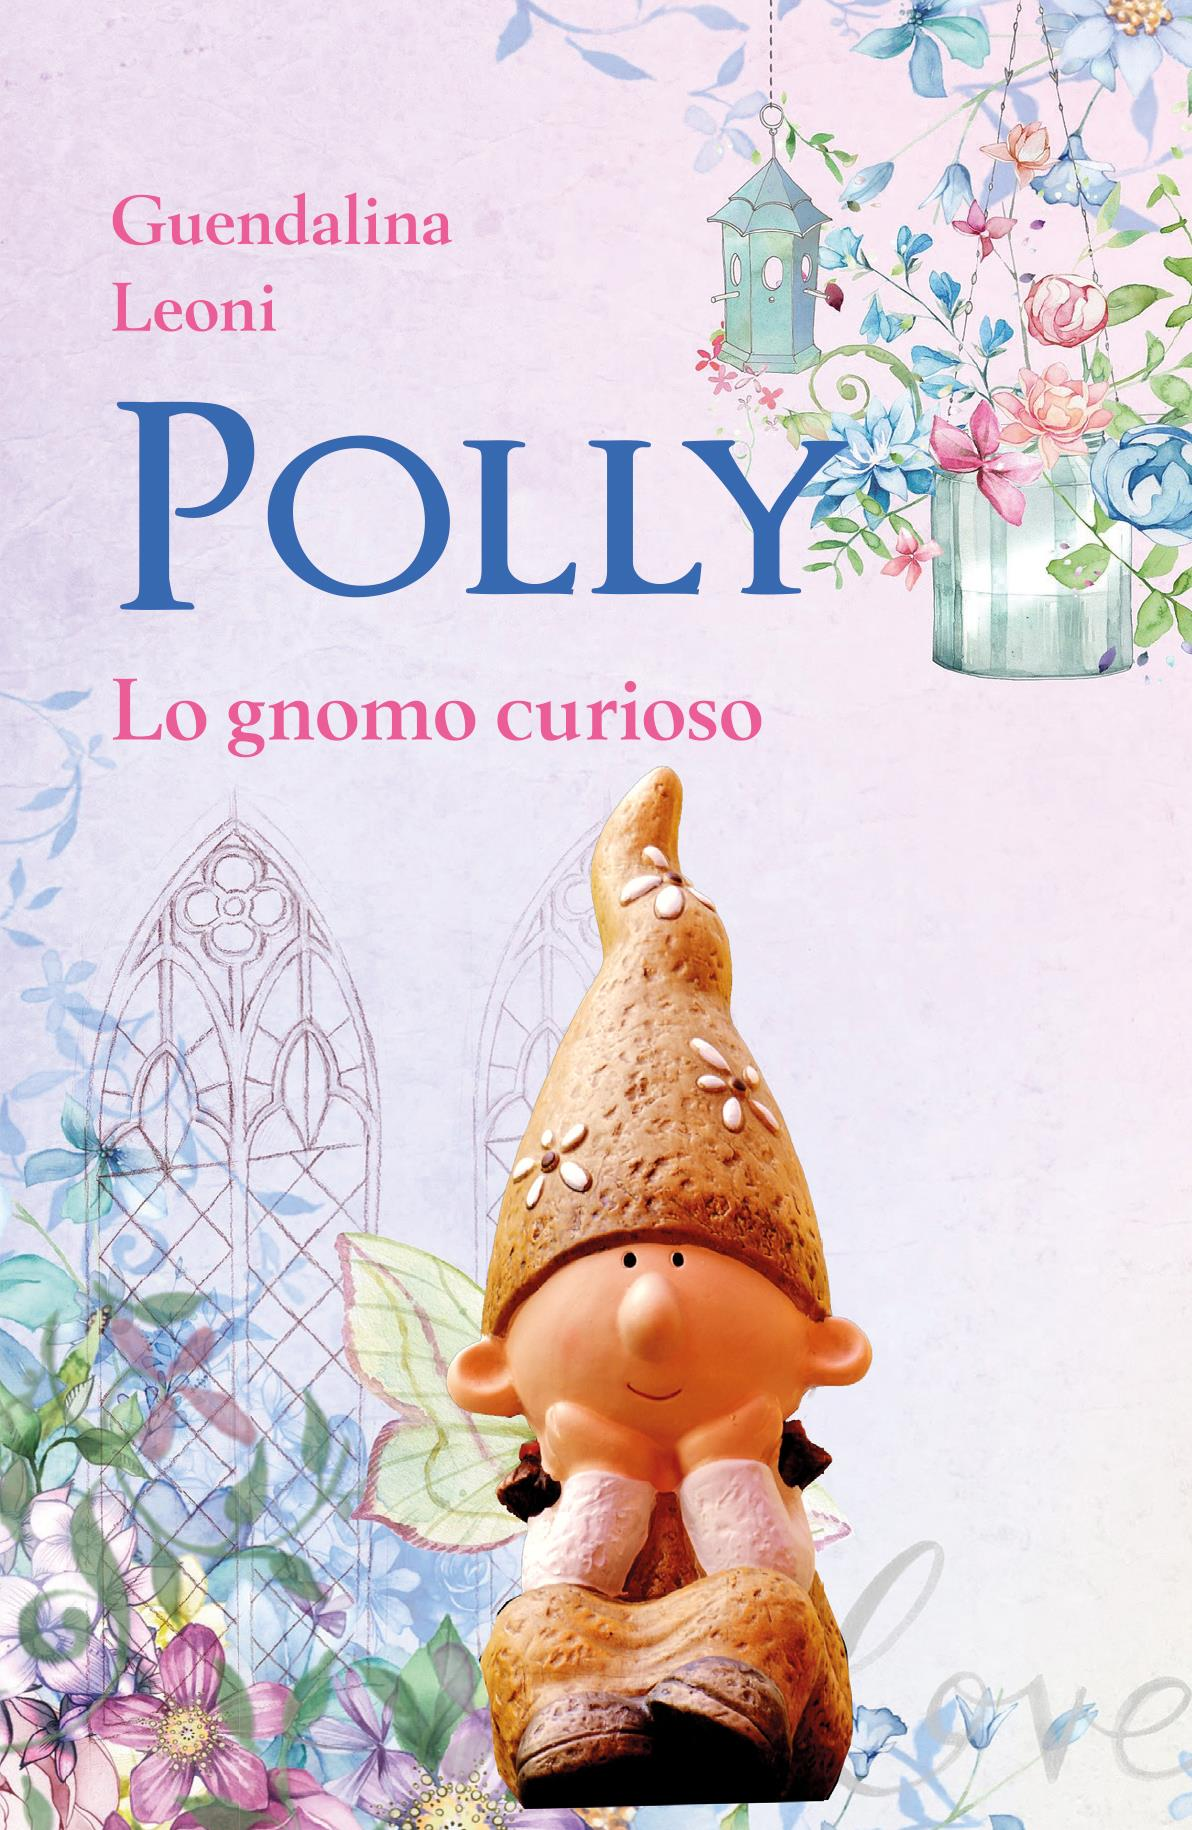 Polly lo gnomo curioso